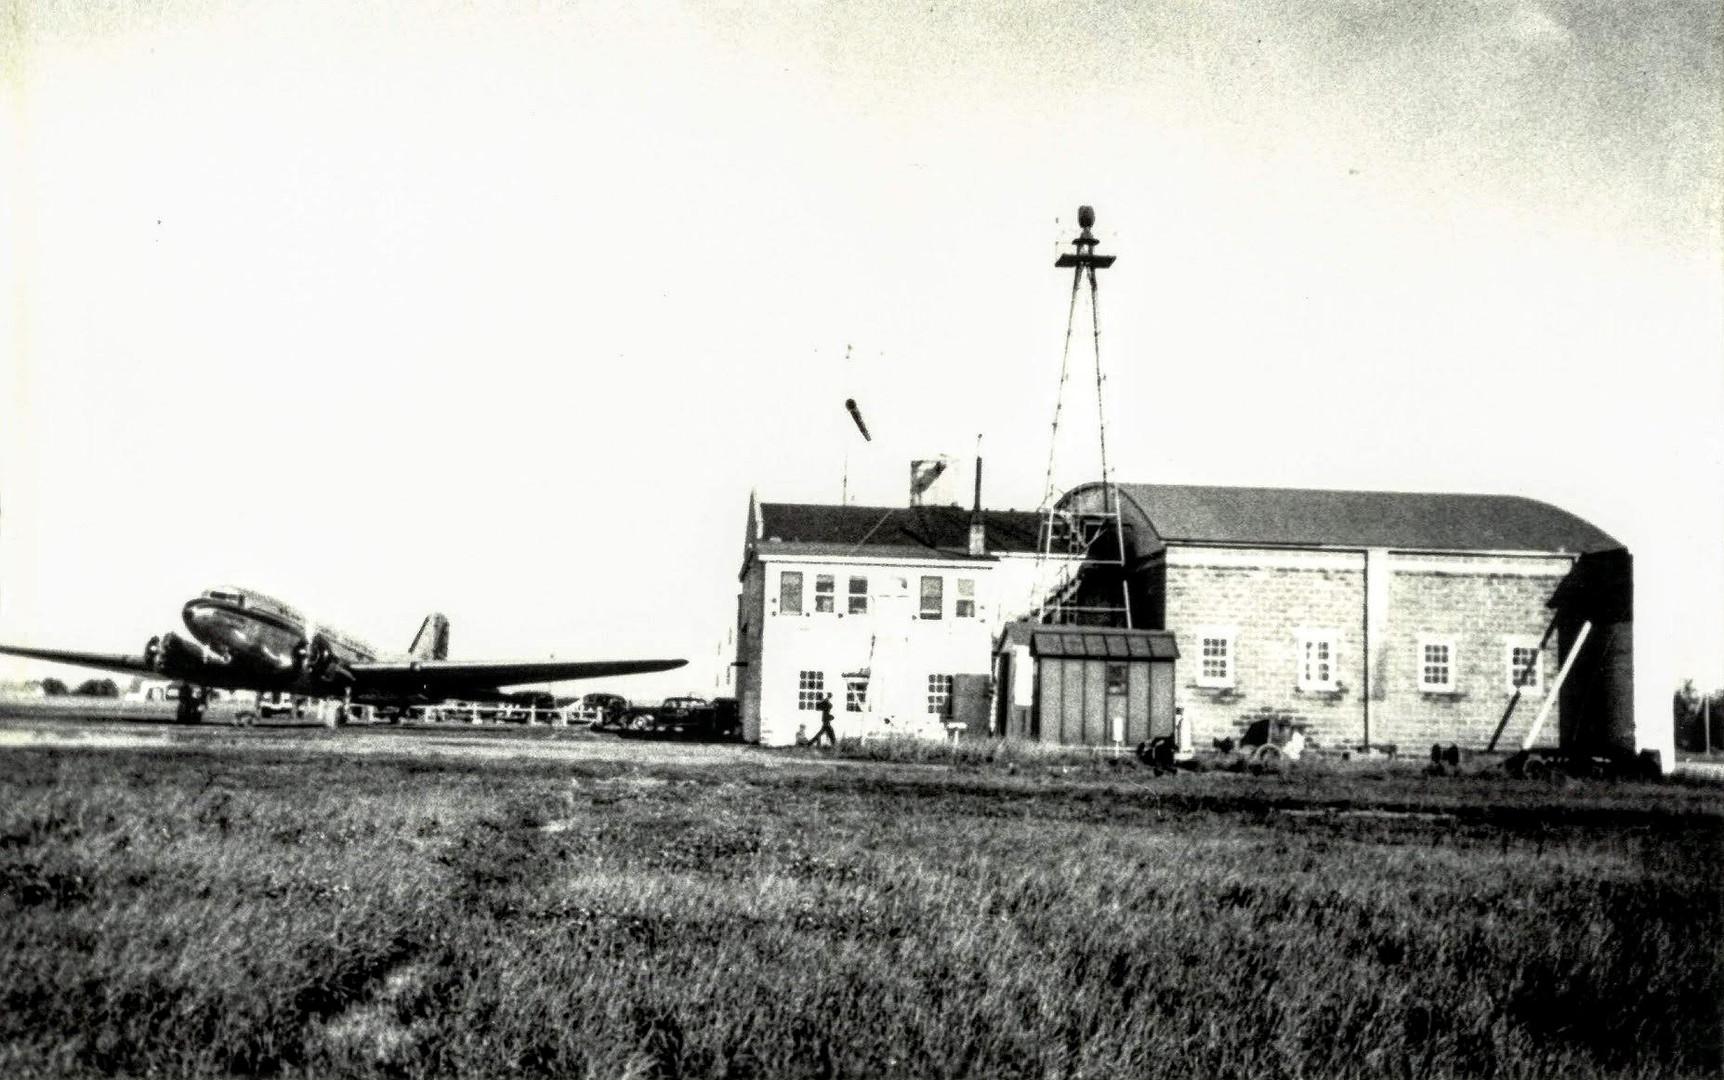 Sault Ste. Marie Municipal Airport, 1939